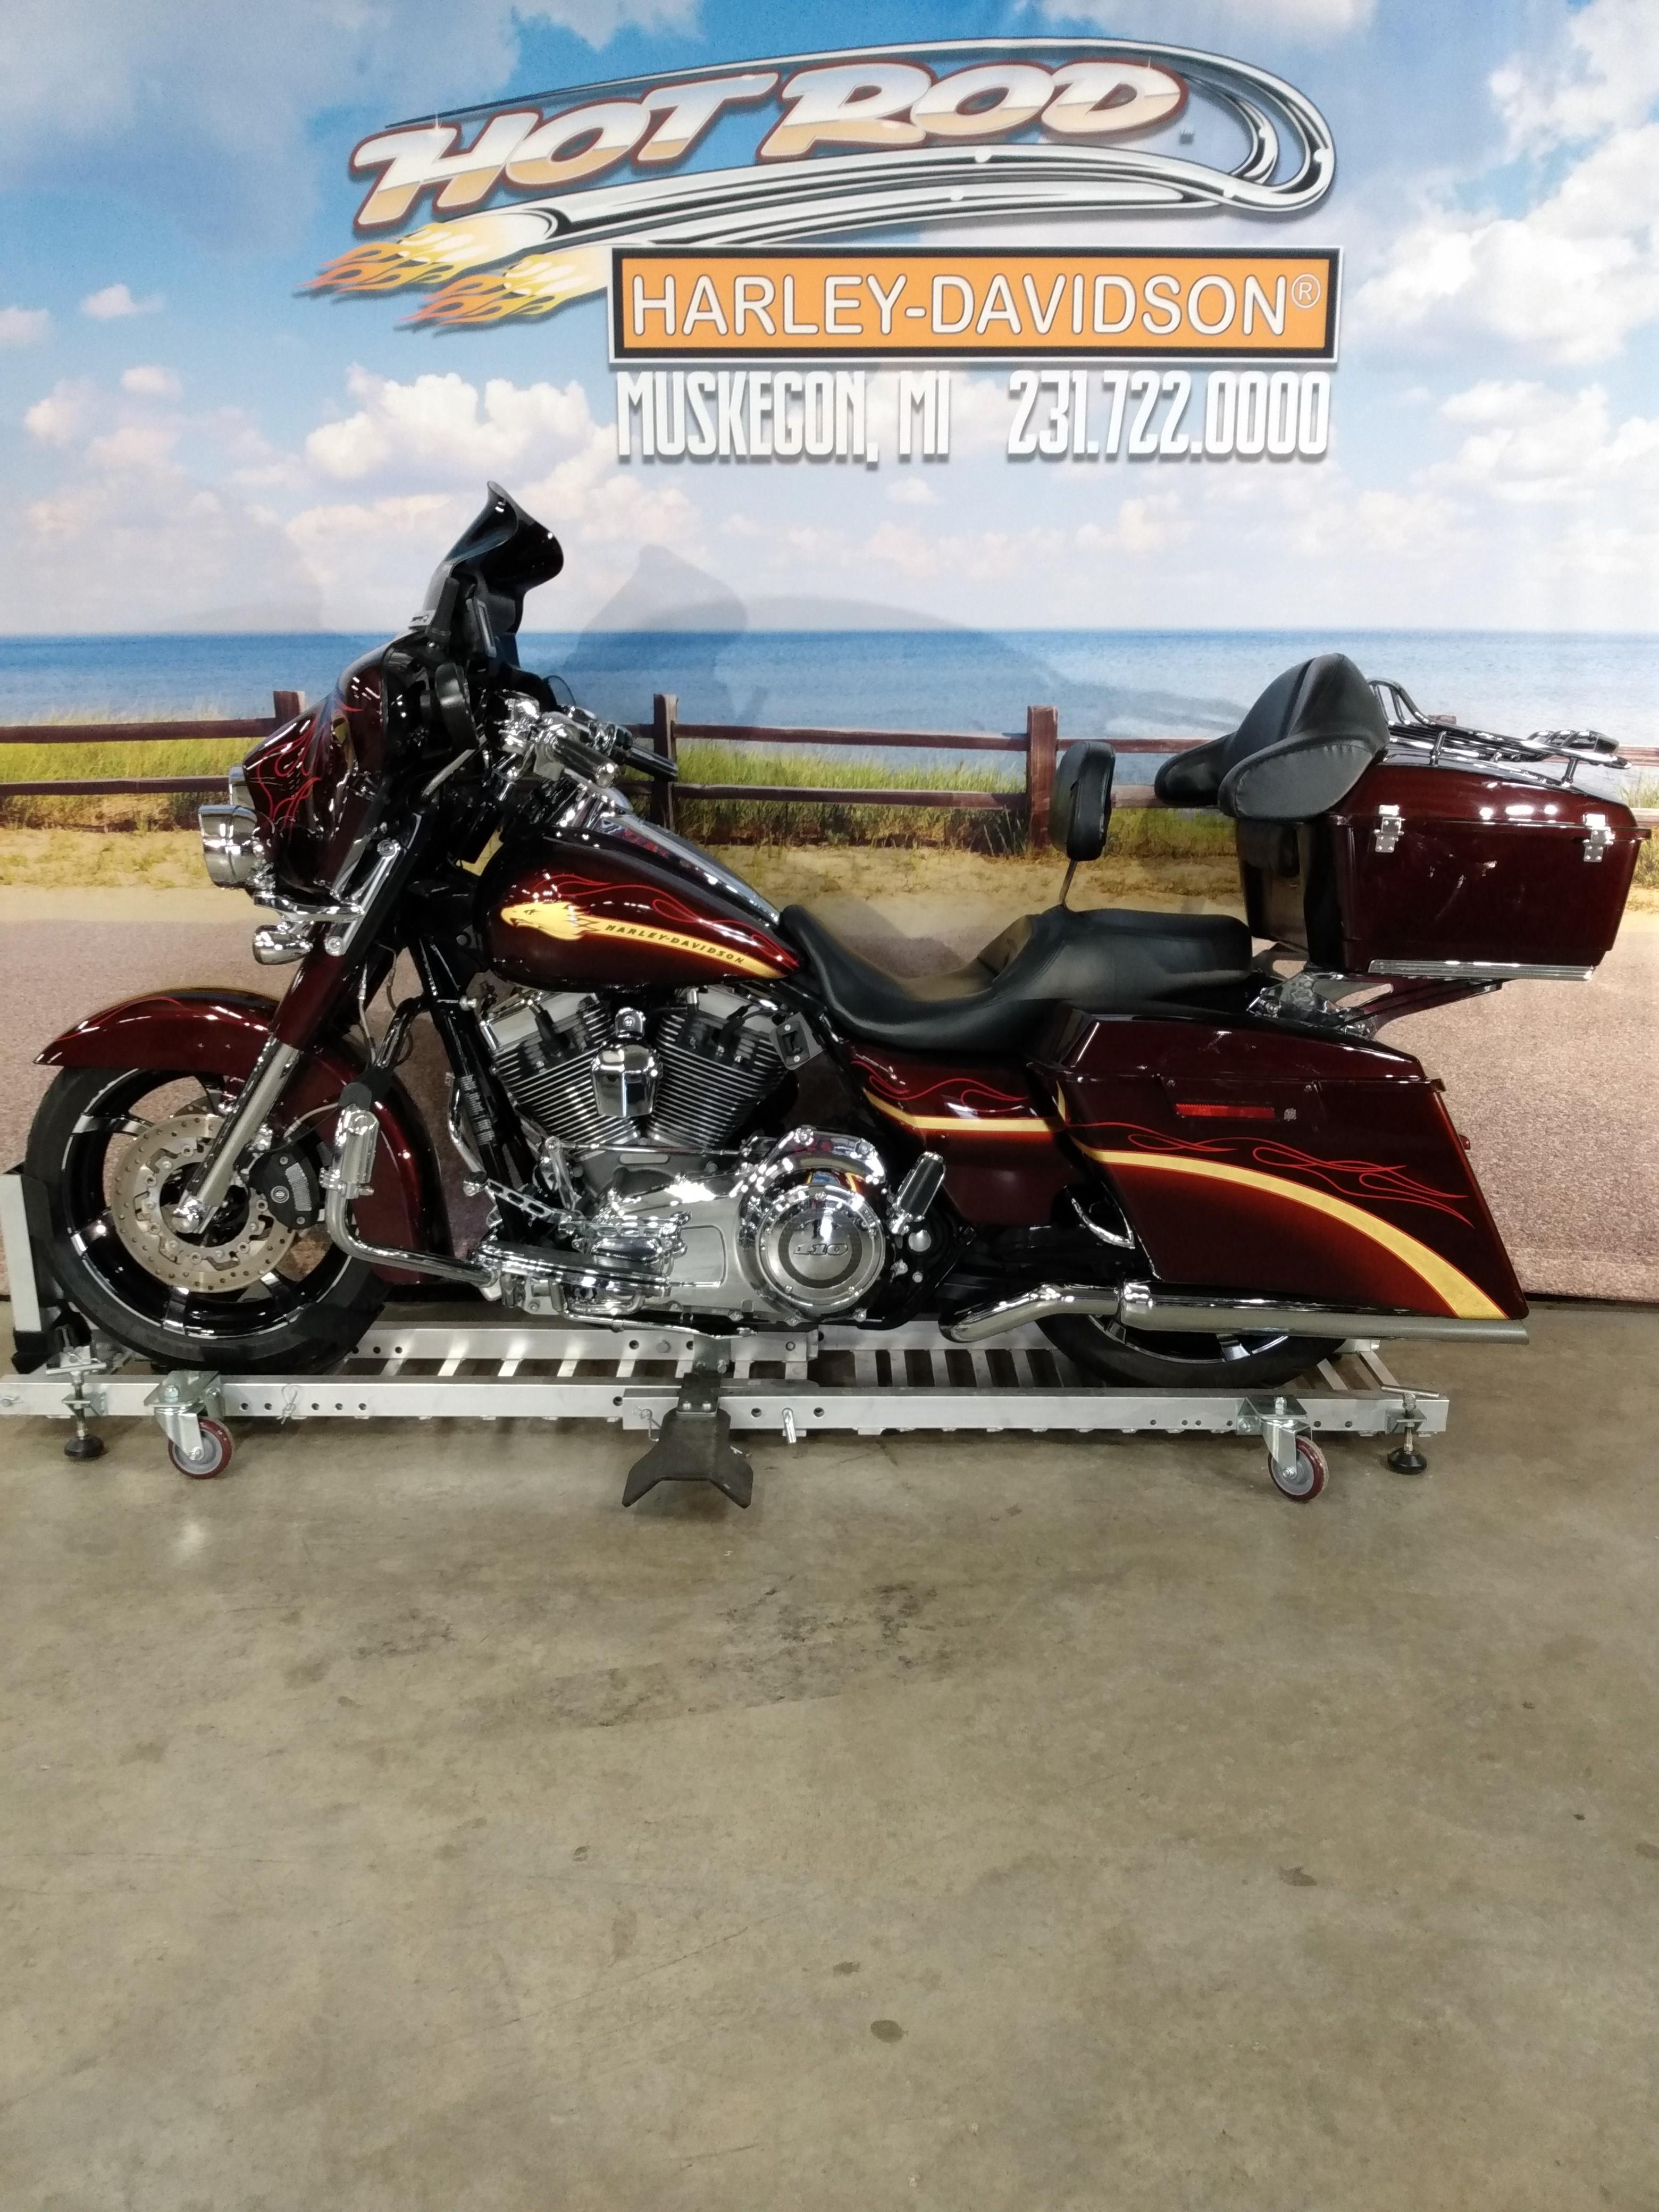 2010 Harley-Davidson Street Glide CVO at Hot Rod Harley-Davidson